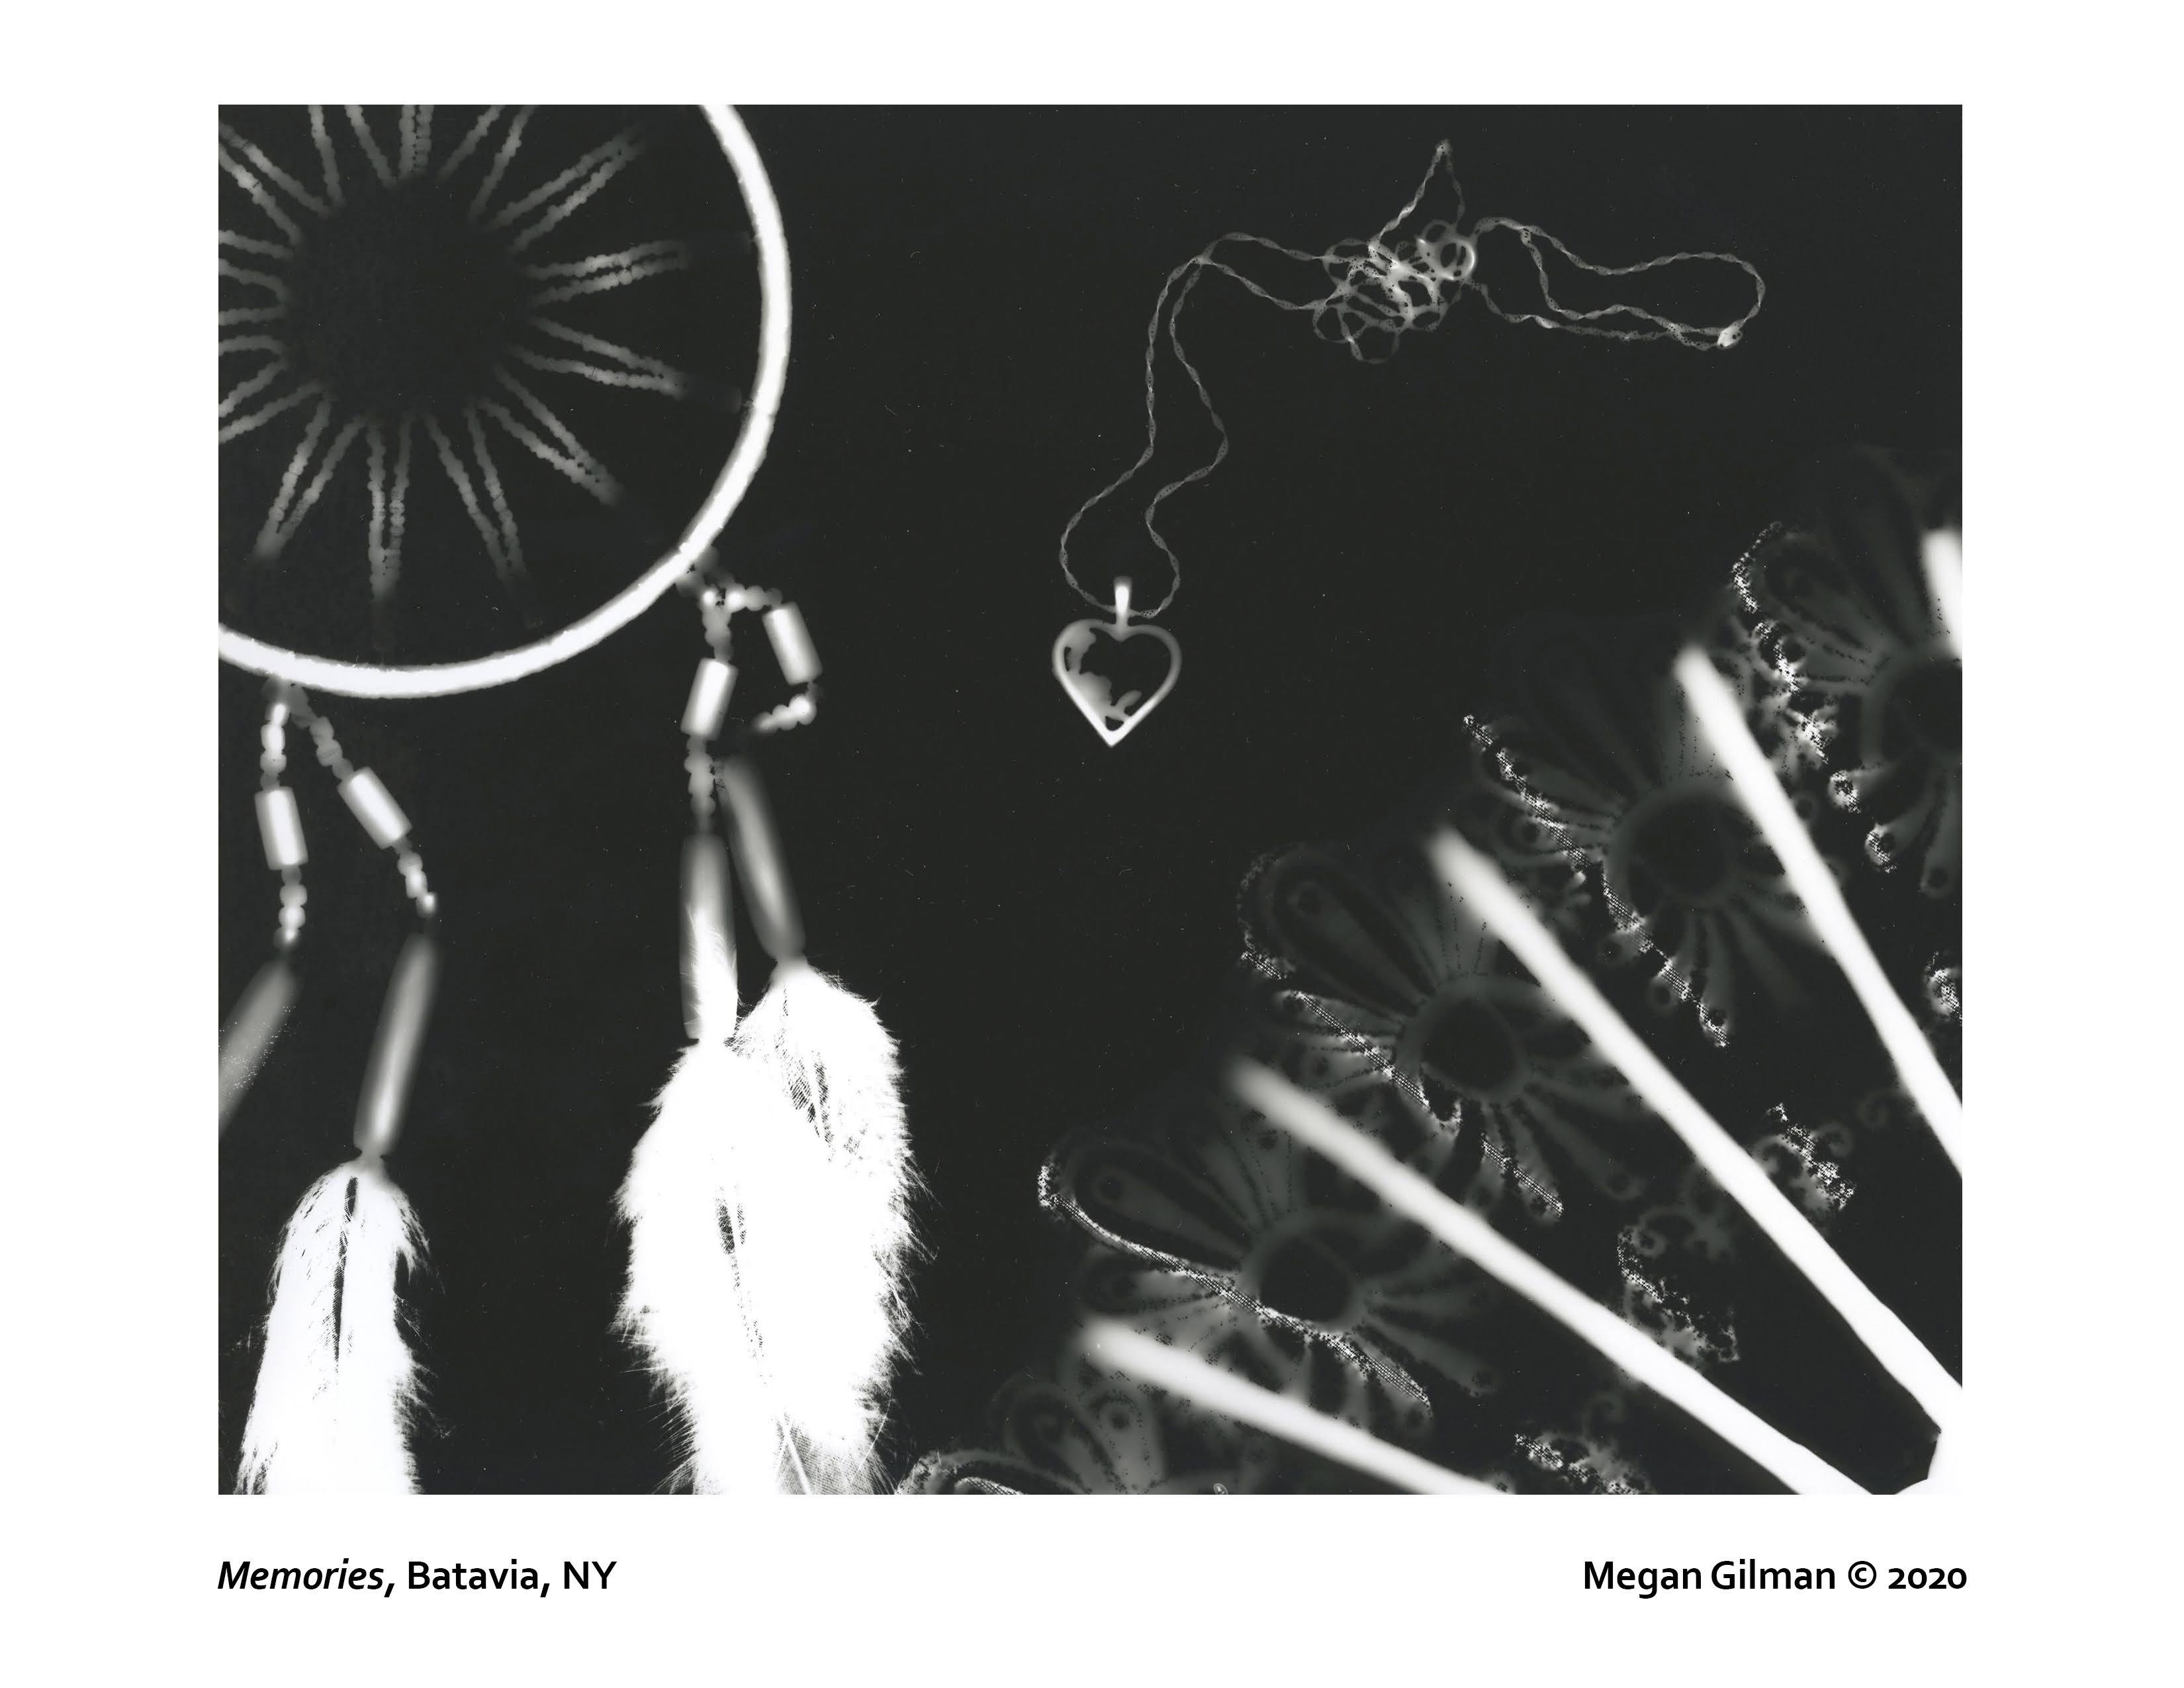 Megan Gilman photogram print